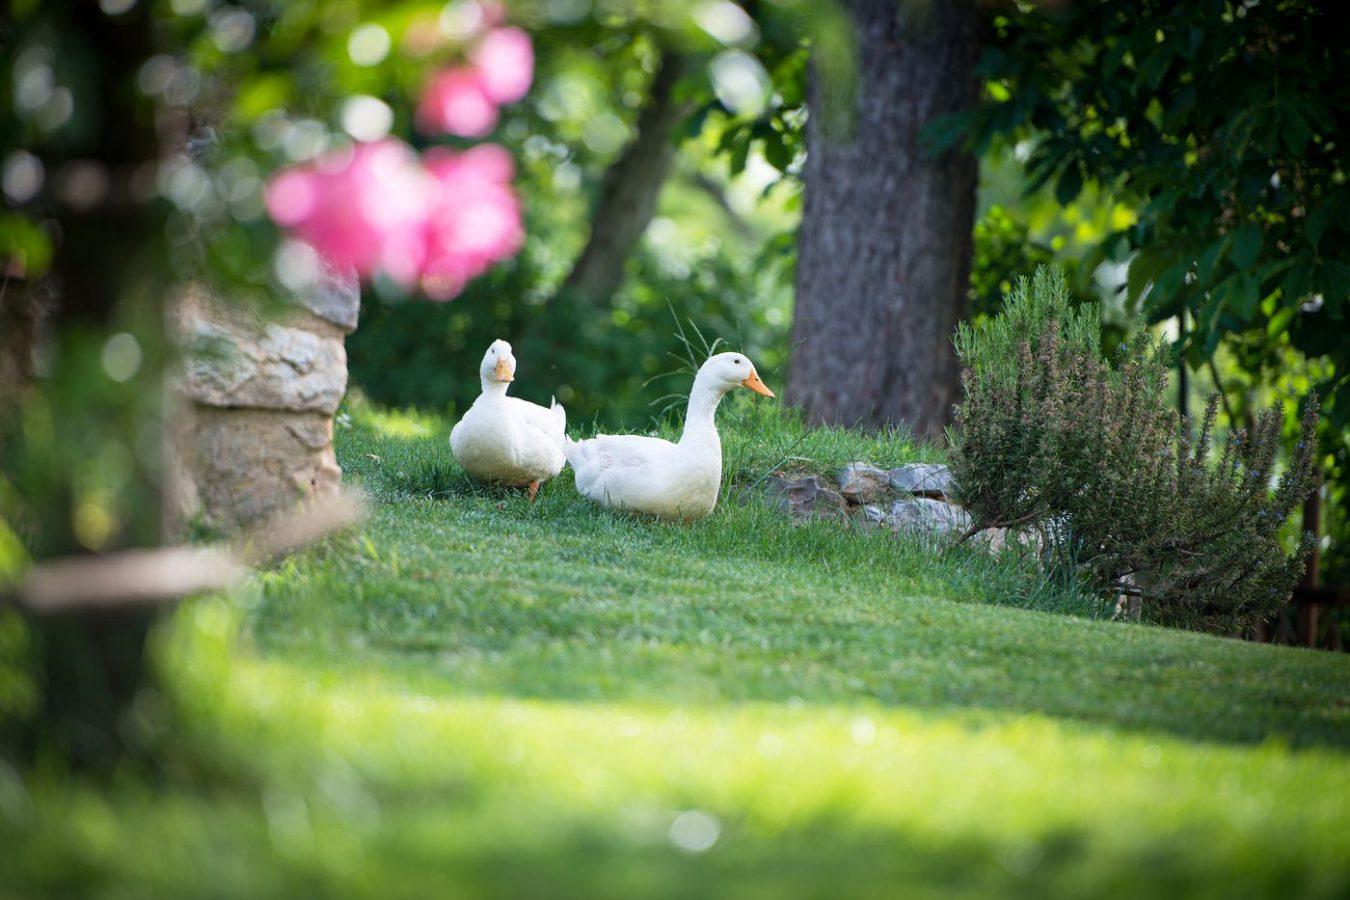 Outdoors Ducks Asa Residence Private Villa Kras Slovenia